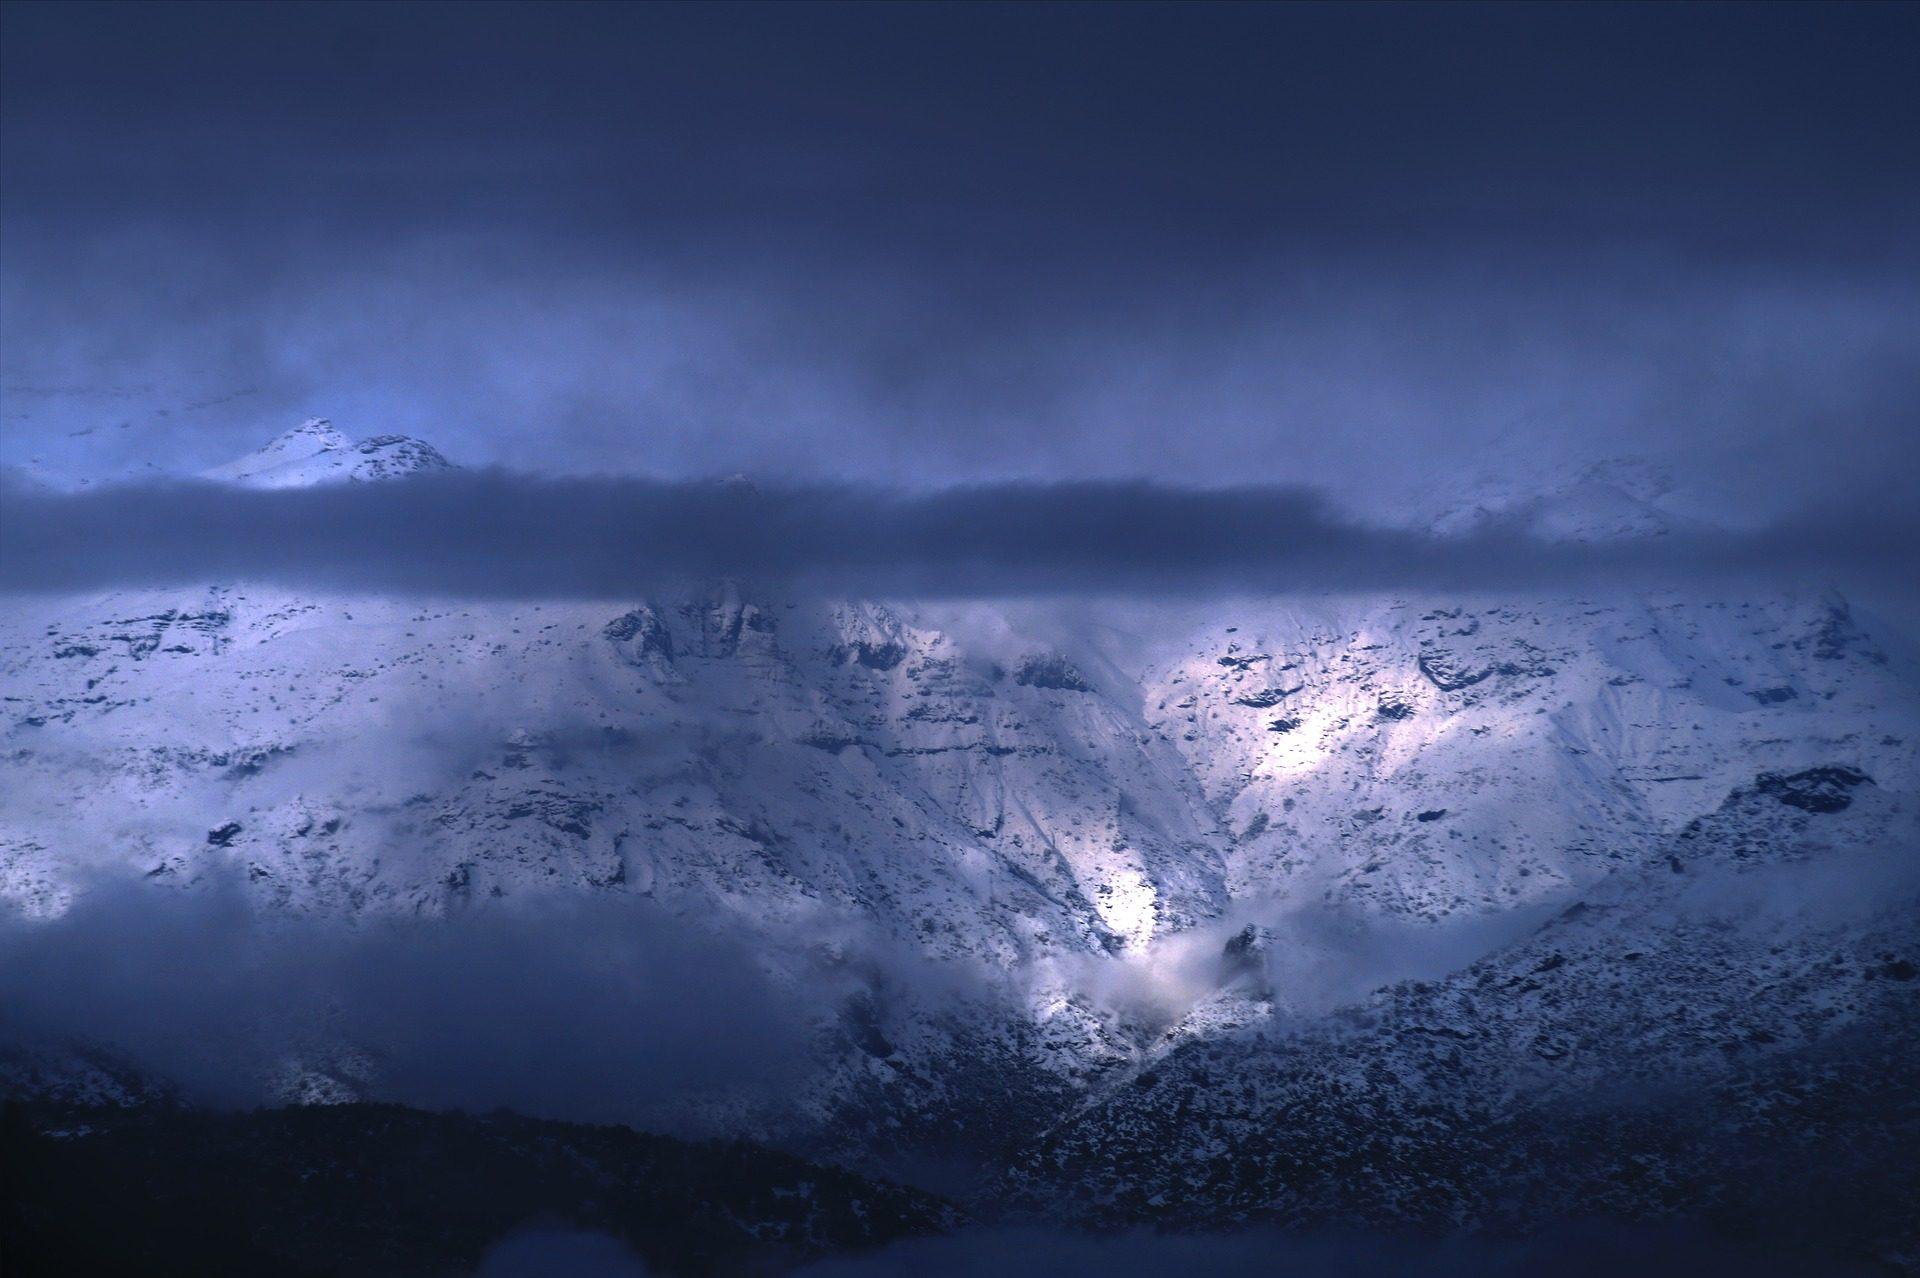 Montañas, neve, Pizza, altezza, nuvole - Sfondi HD - Professor-falken.com